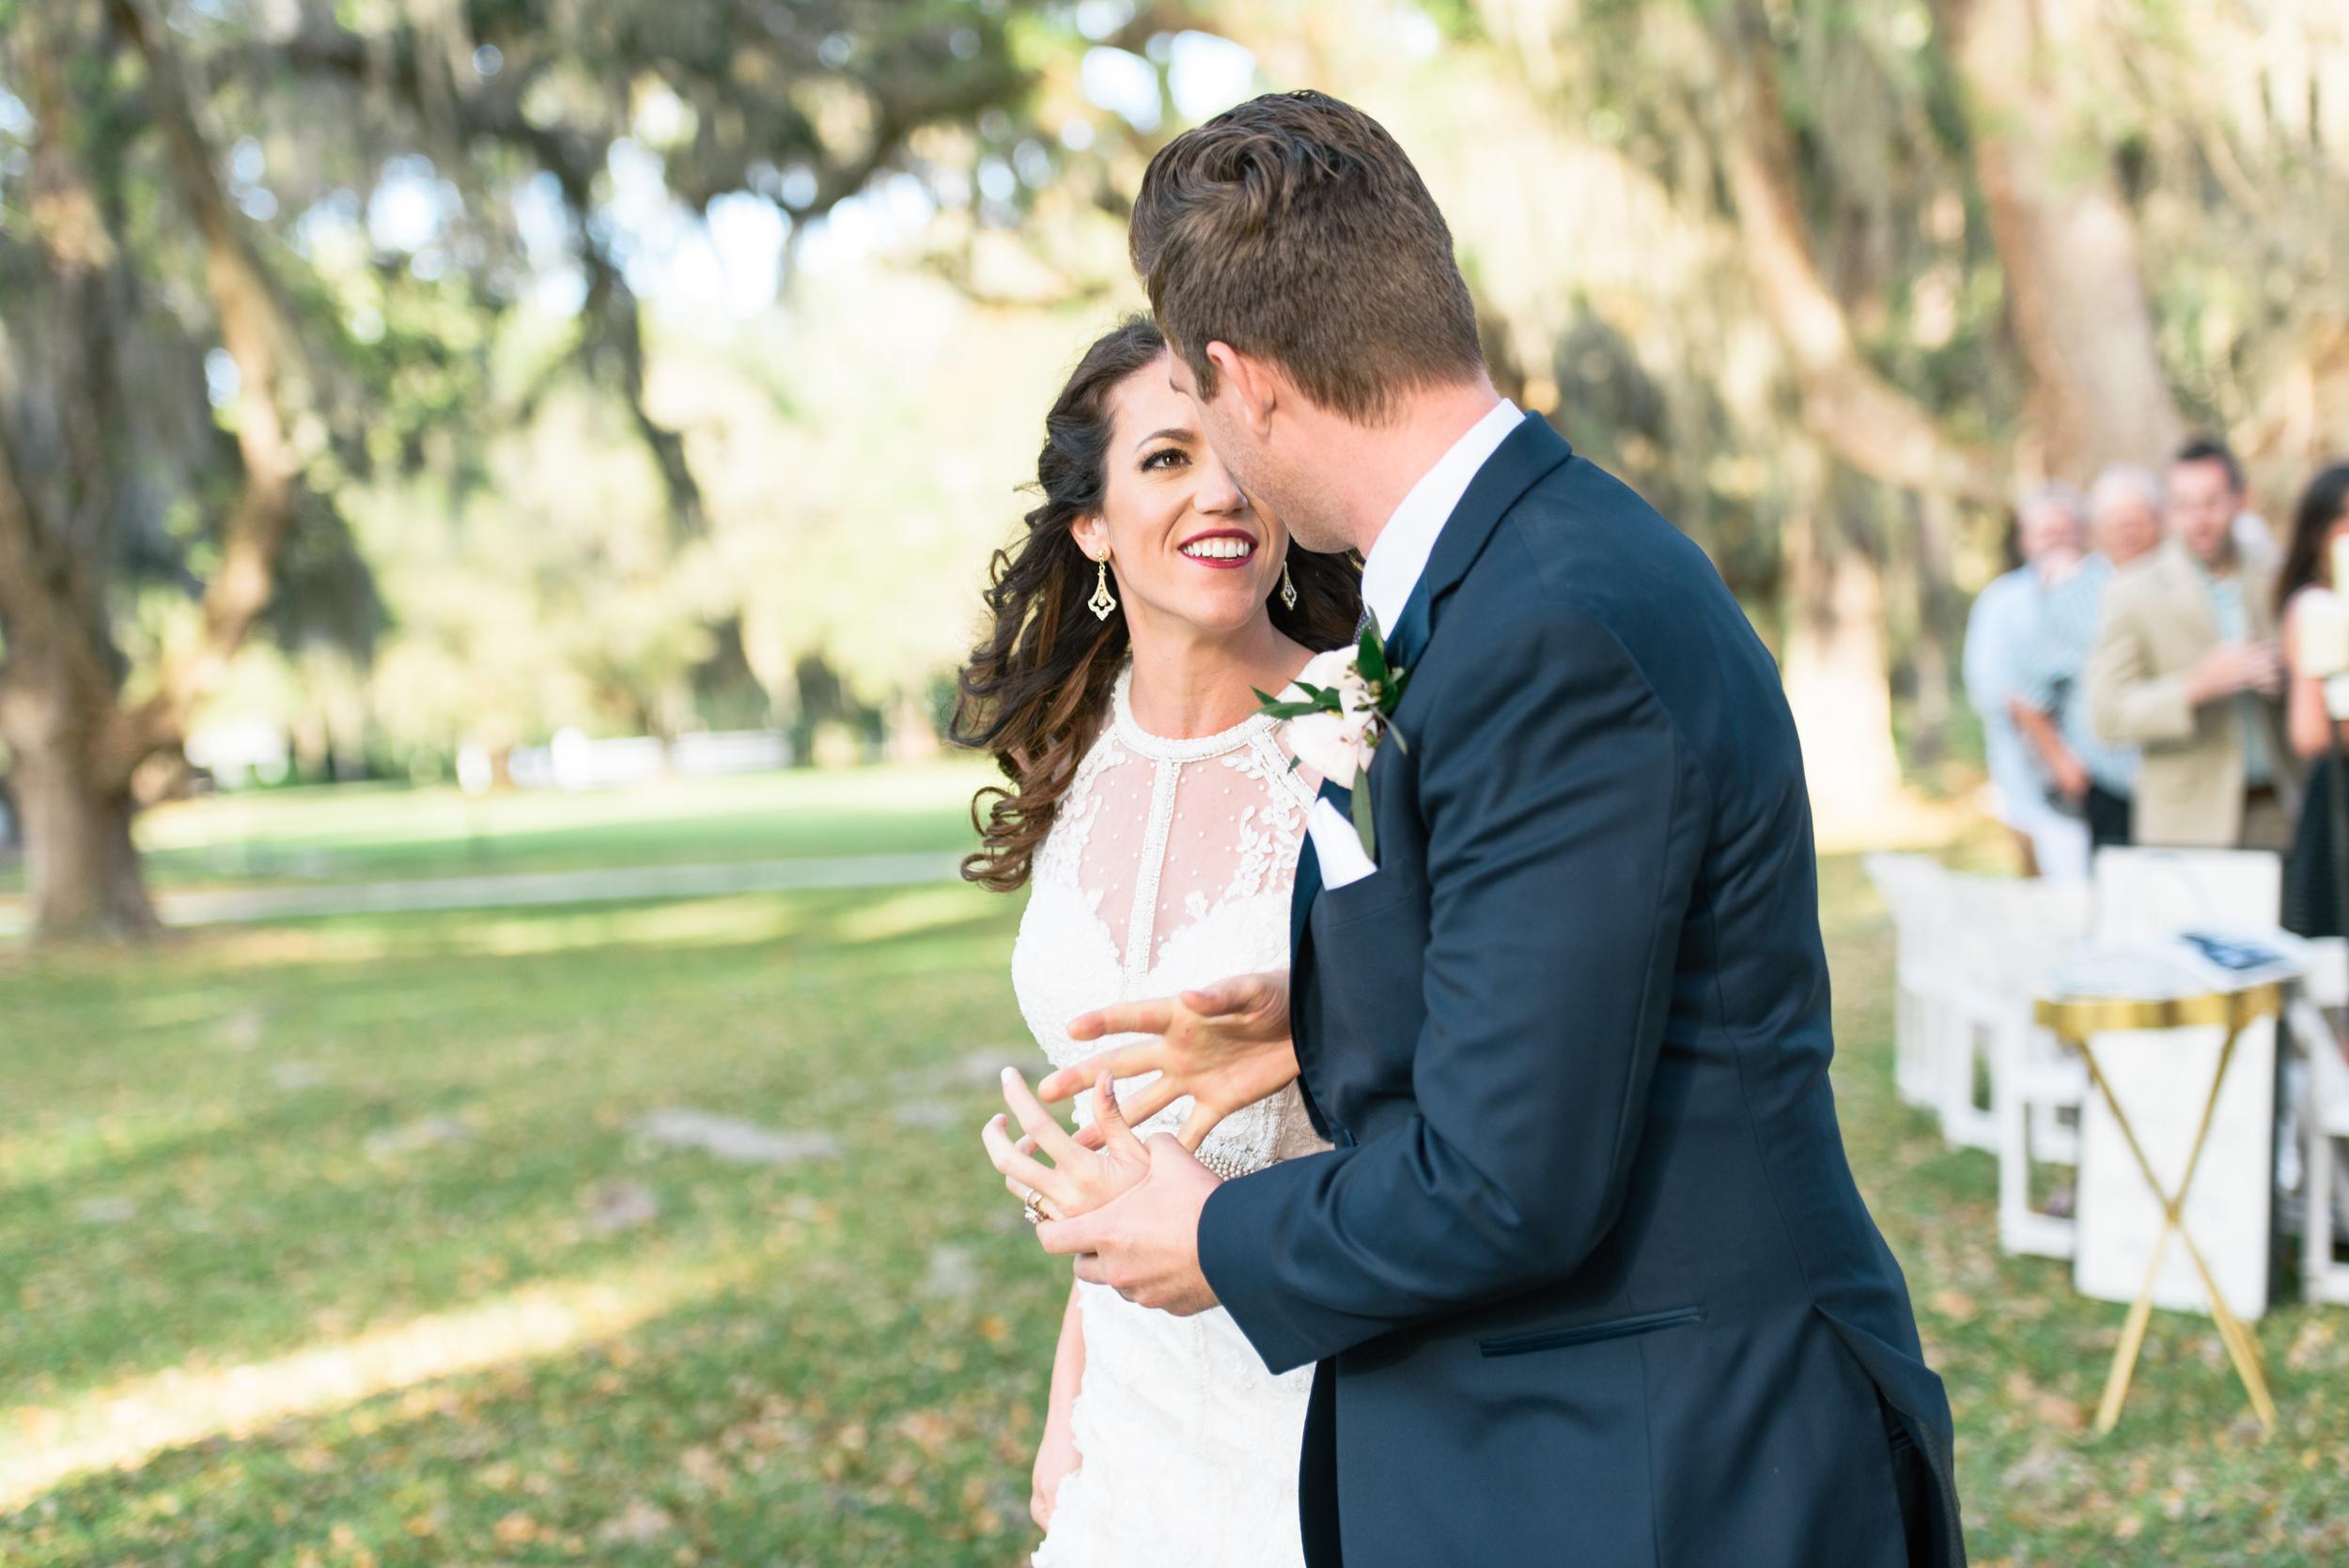 kadi-and-matt-carroll-april-9-2016-jekyl-island-wedding-m-newsom-photography- (252 of 484).jpg